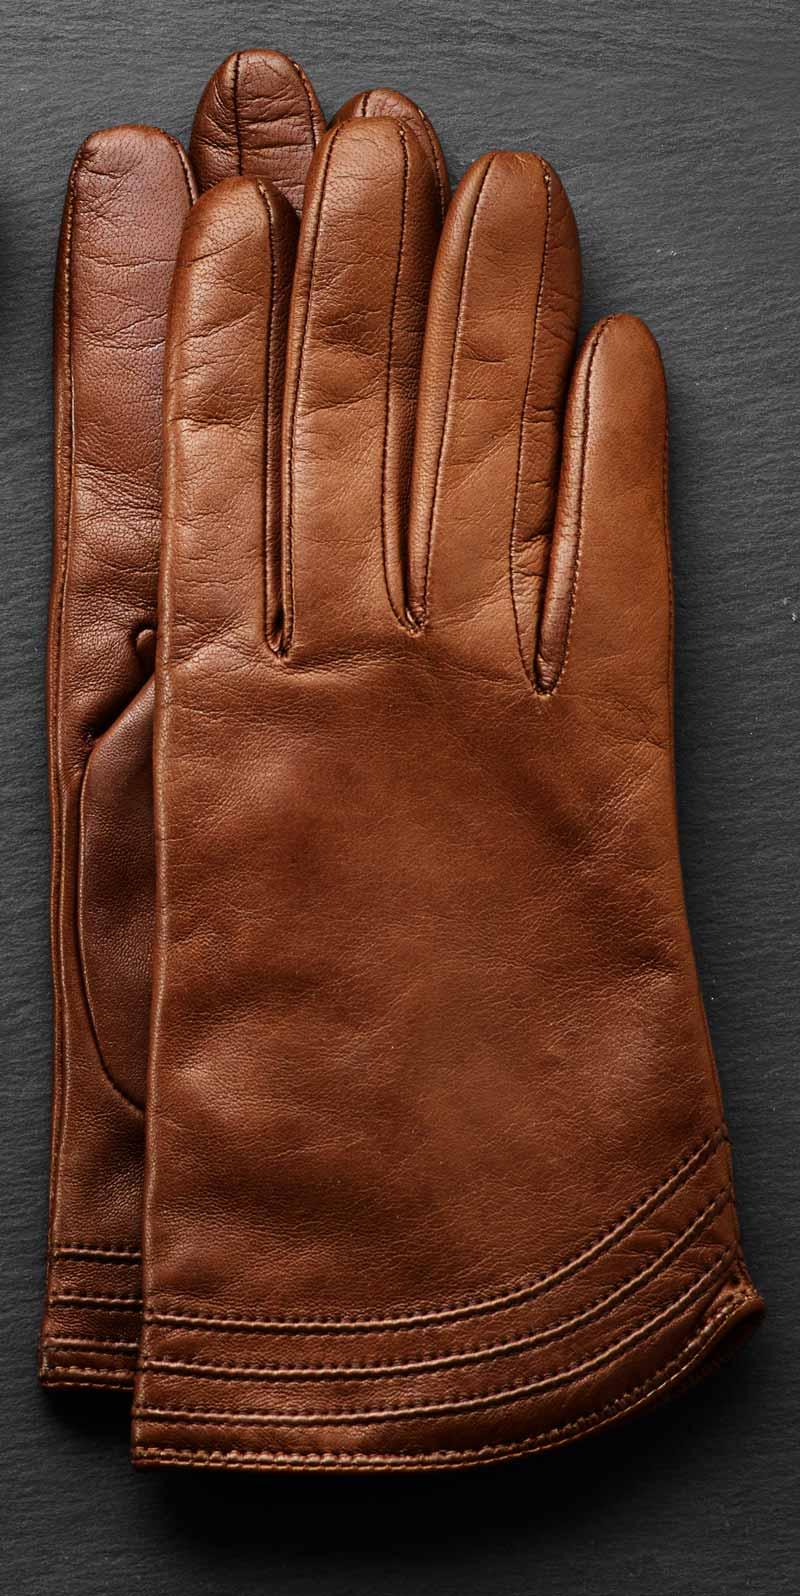 MRS. NUCLEUS | gloves by OTTO Kessler